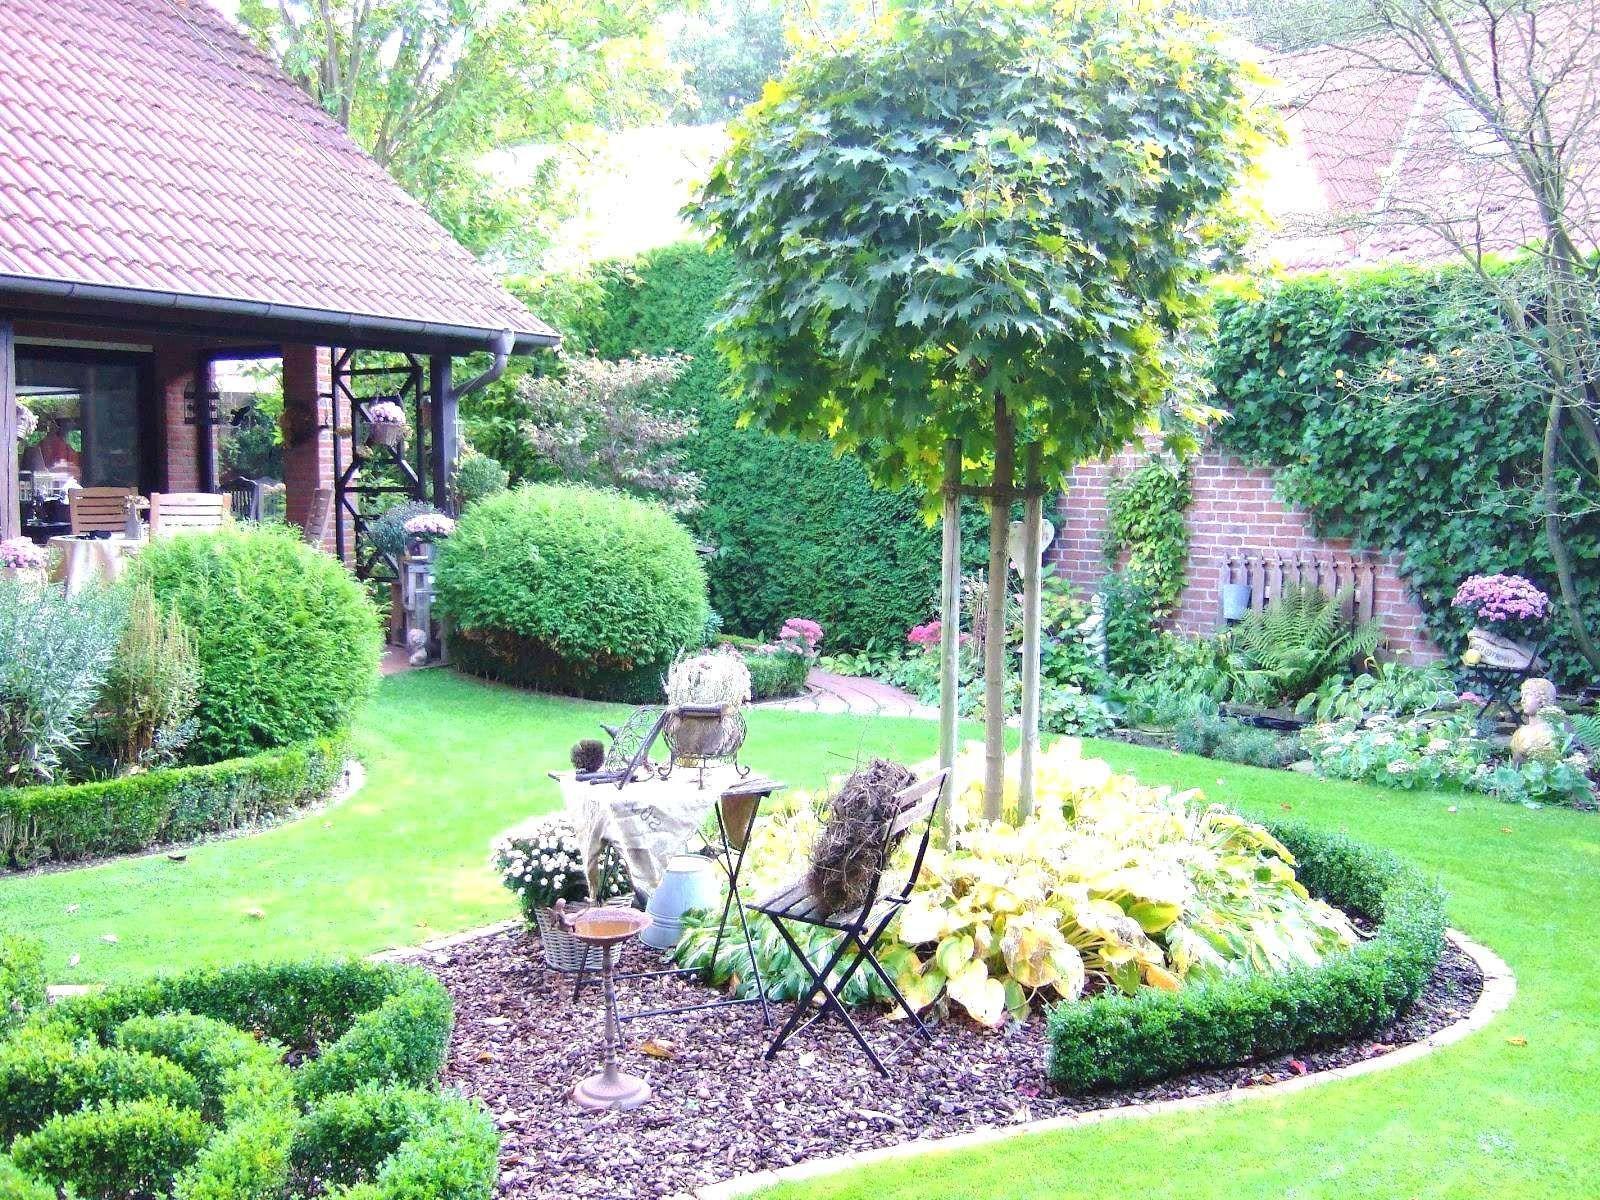 Gartengestaltung Vorgarten Schön Garten Ideas Garten Anlegen Inspirational Aussenleuchten